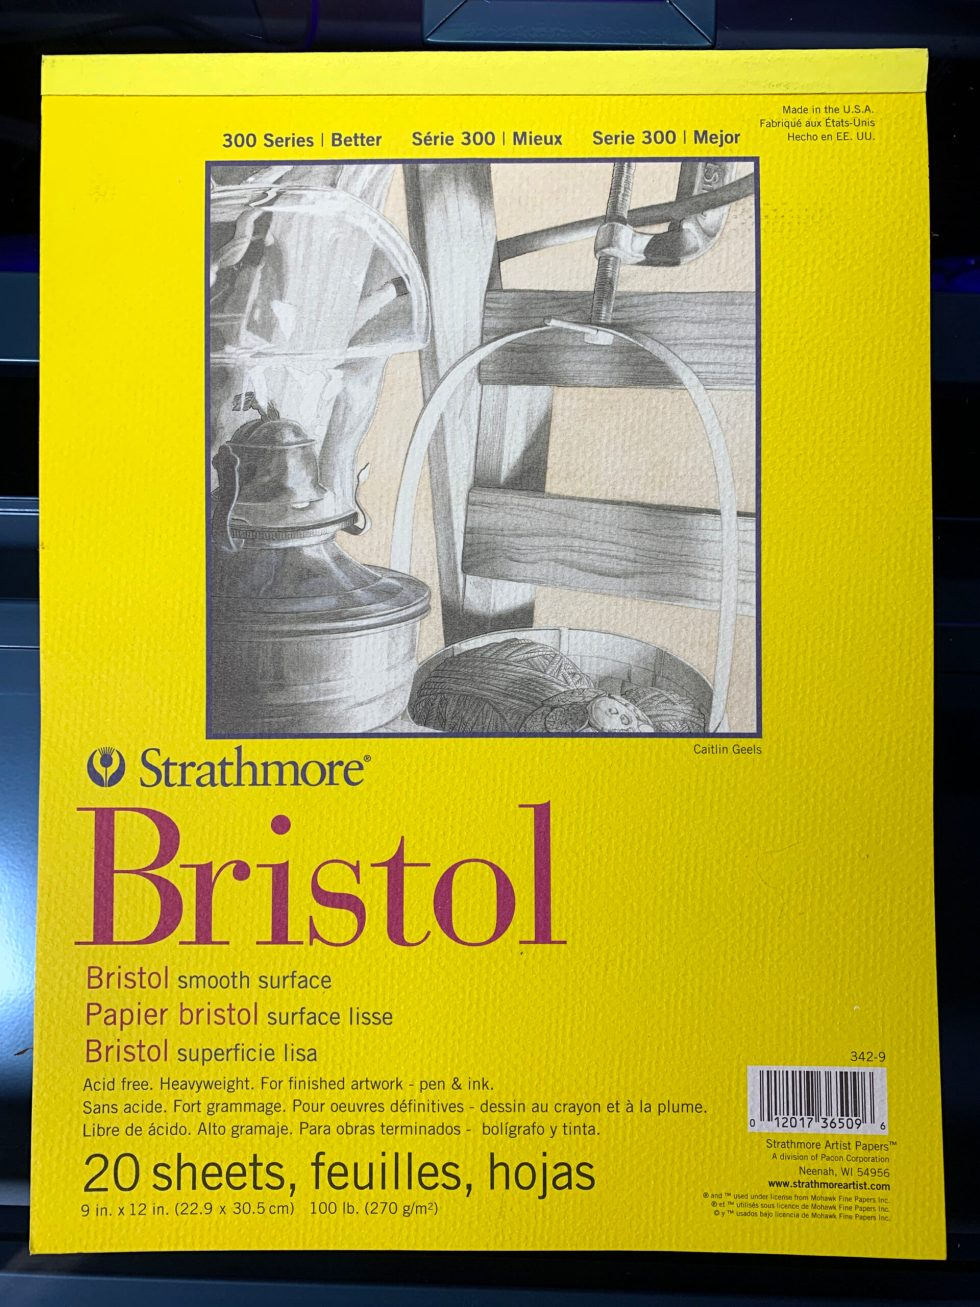 Strathmore Bristol Paper 300 series image 1